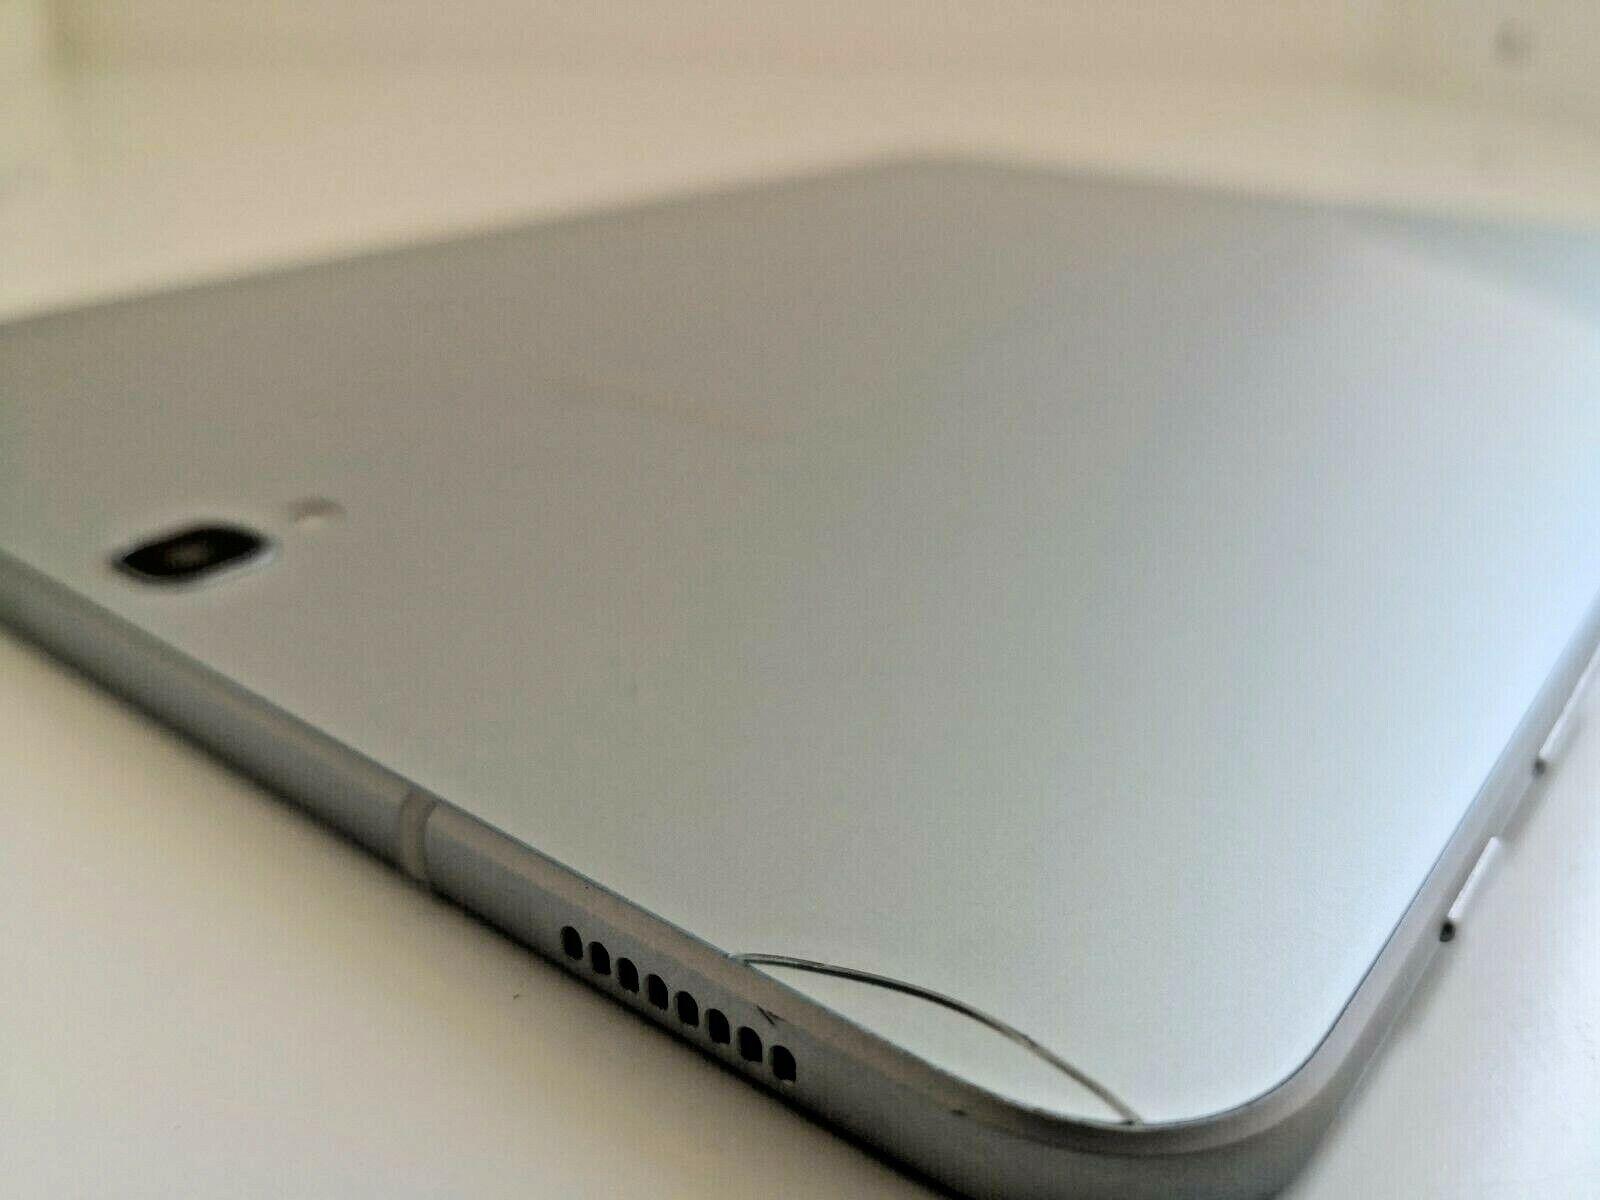 Samsung galaxy tab s3 sm-t820 tablette 9.7